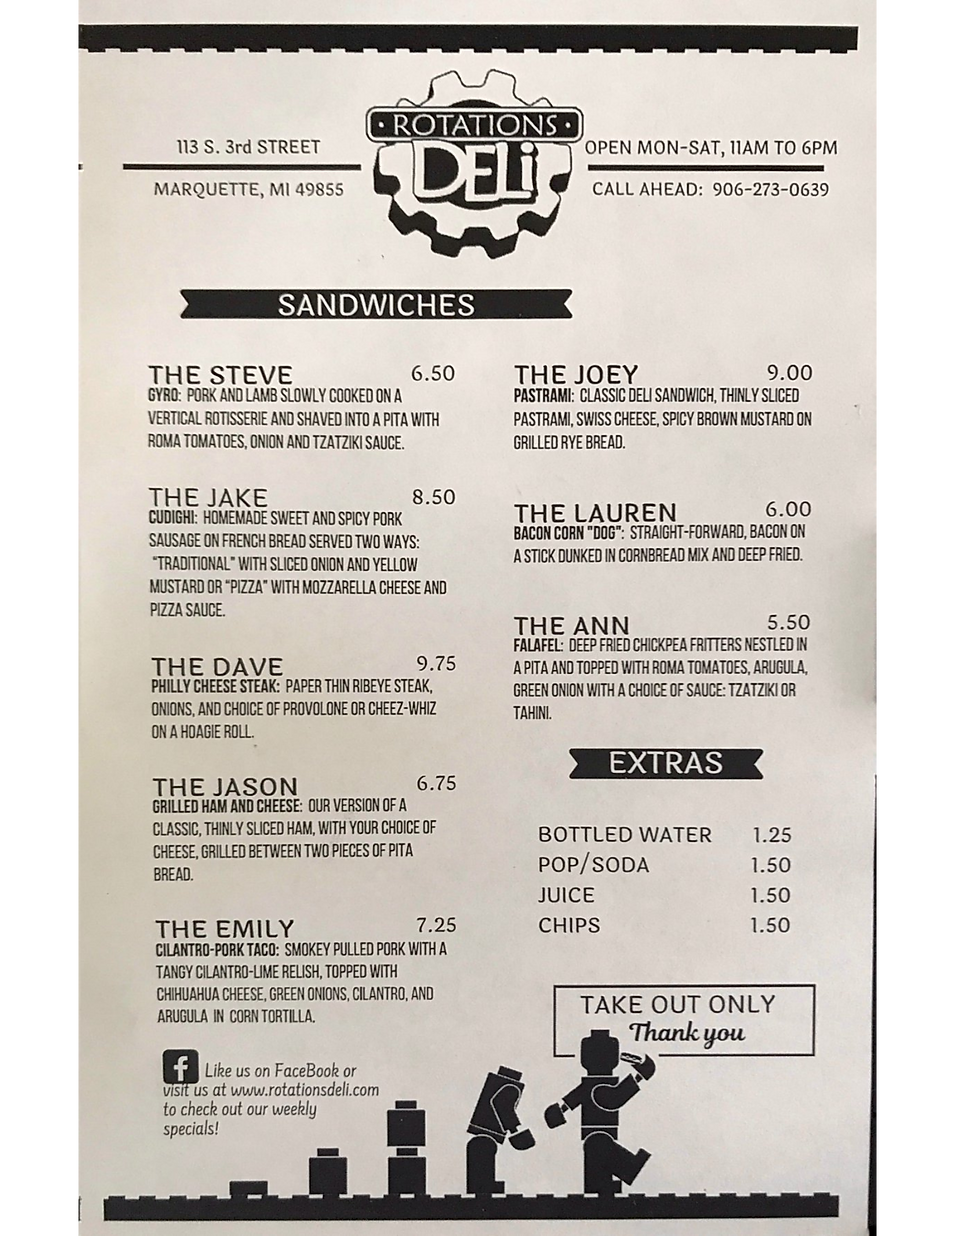 Rotations Deli restaurant menu hours location deals Marquette Now